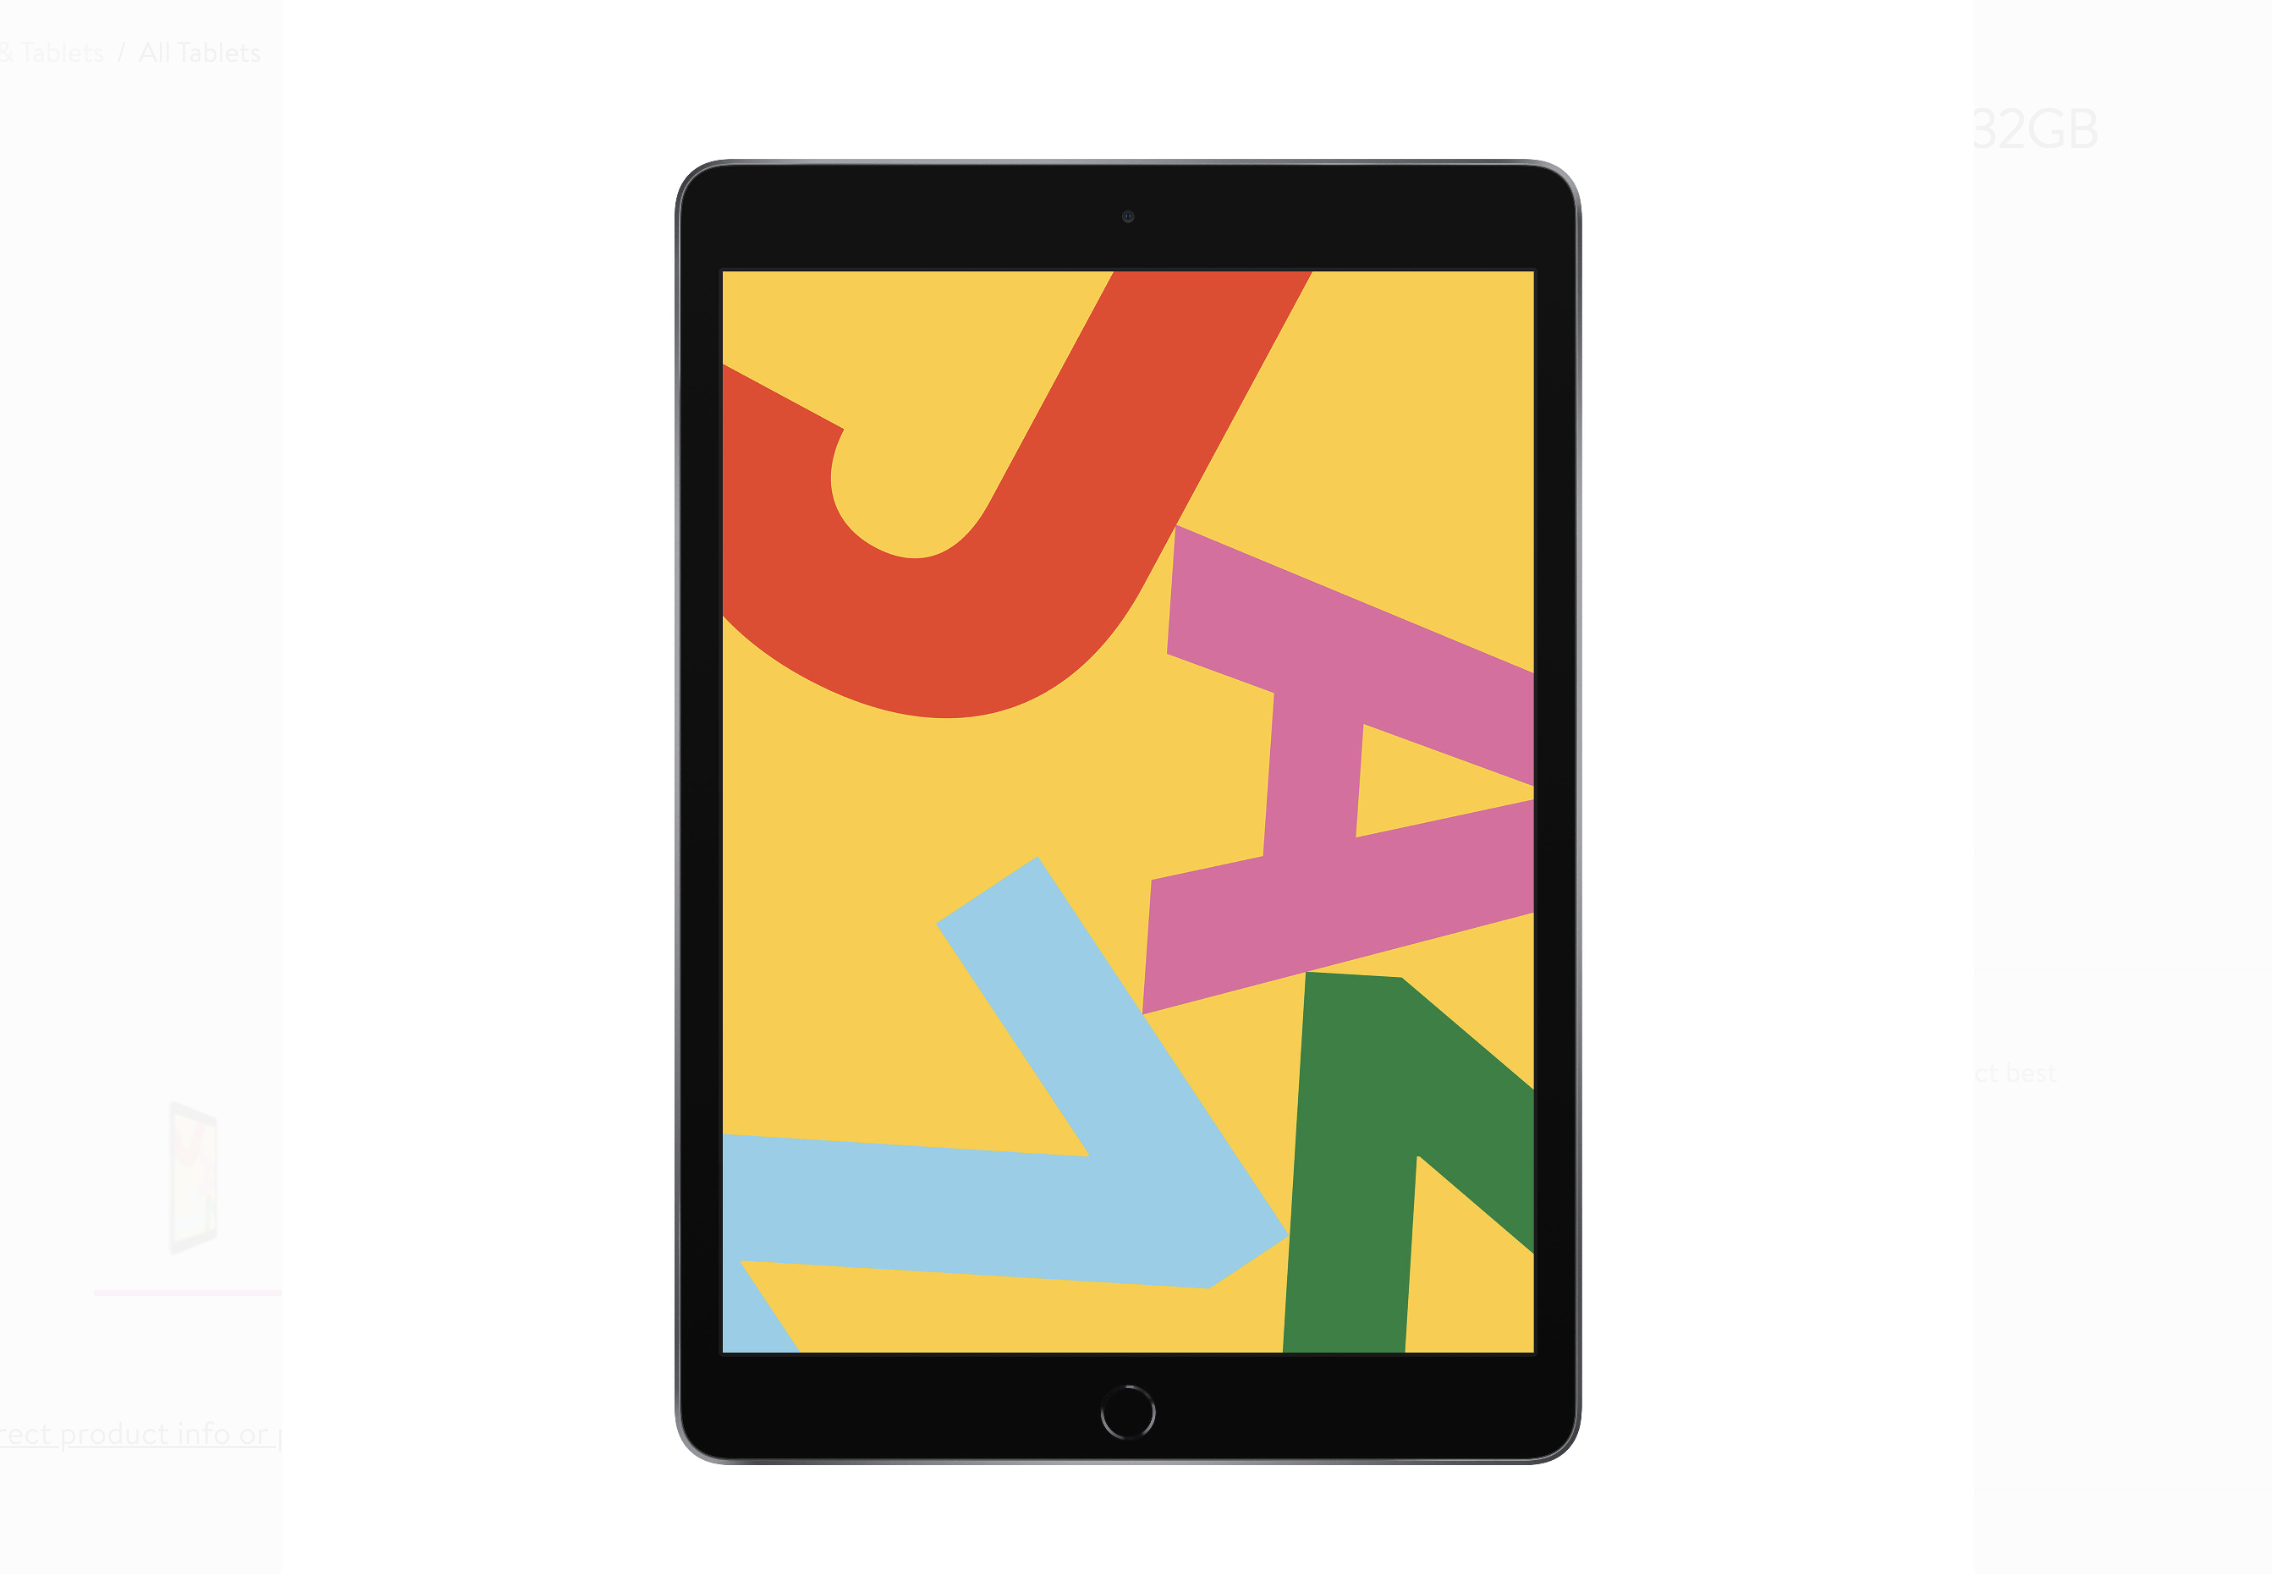 Latest Apple iPad discounted again in last-minute Amazon deal